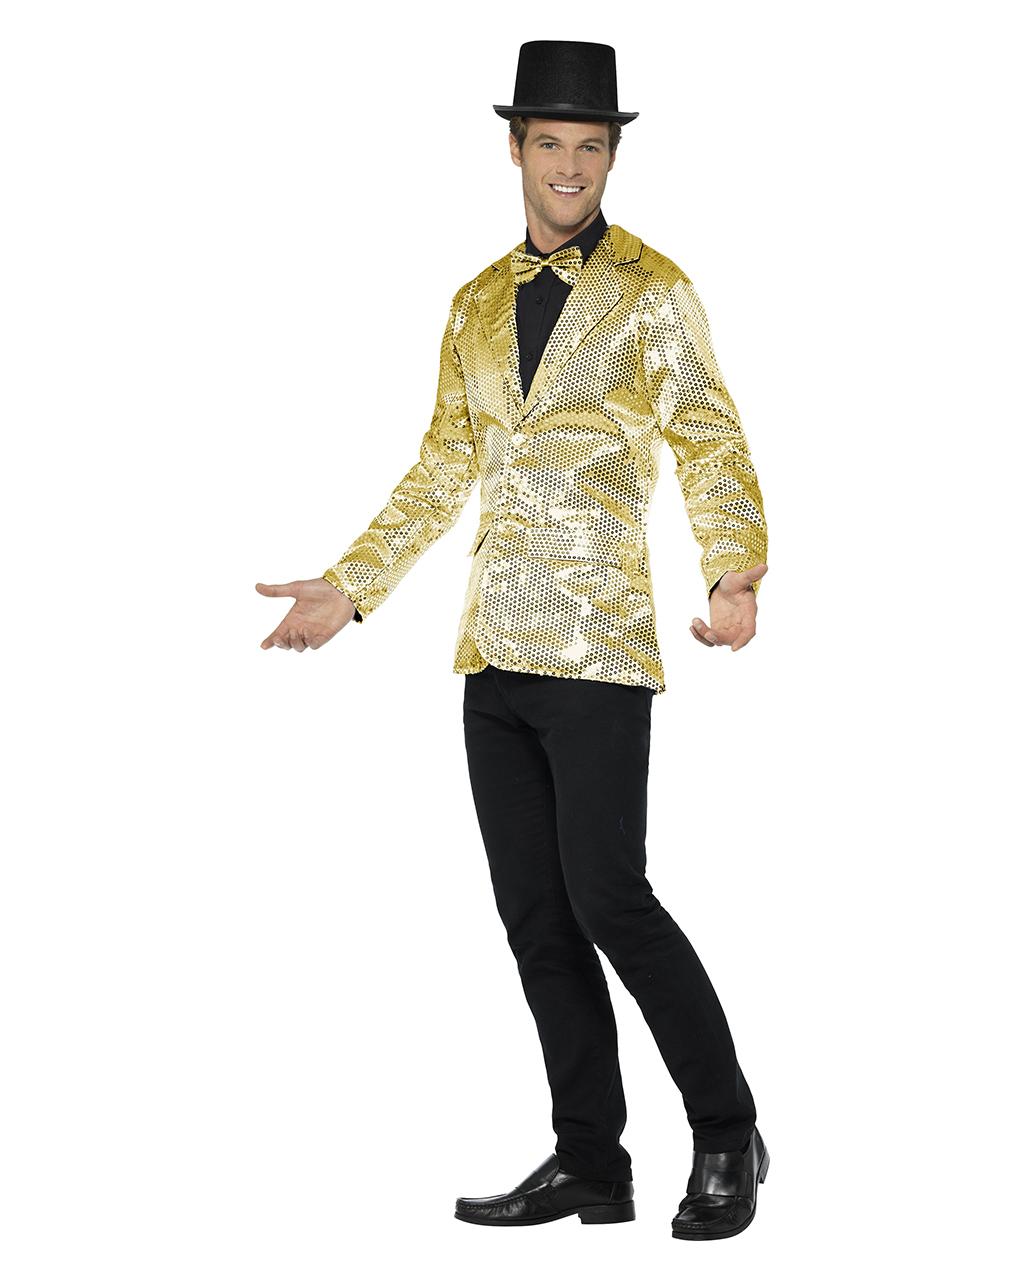 Goldene Manner Pailletten Jacke Online Bestellen Karneval Universe